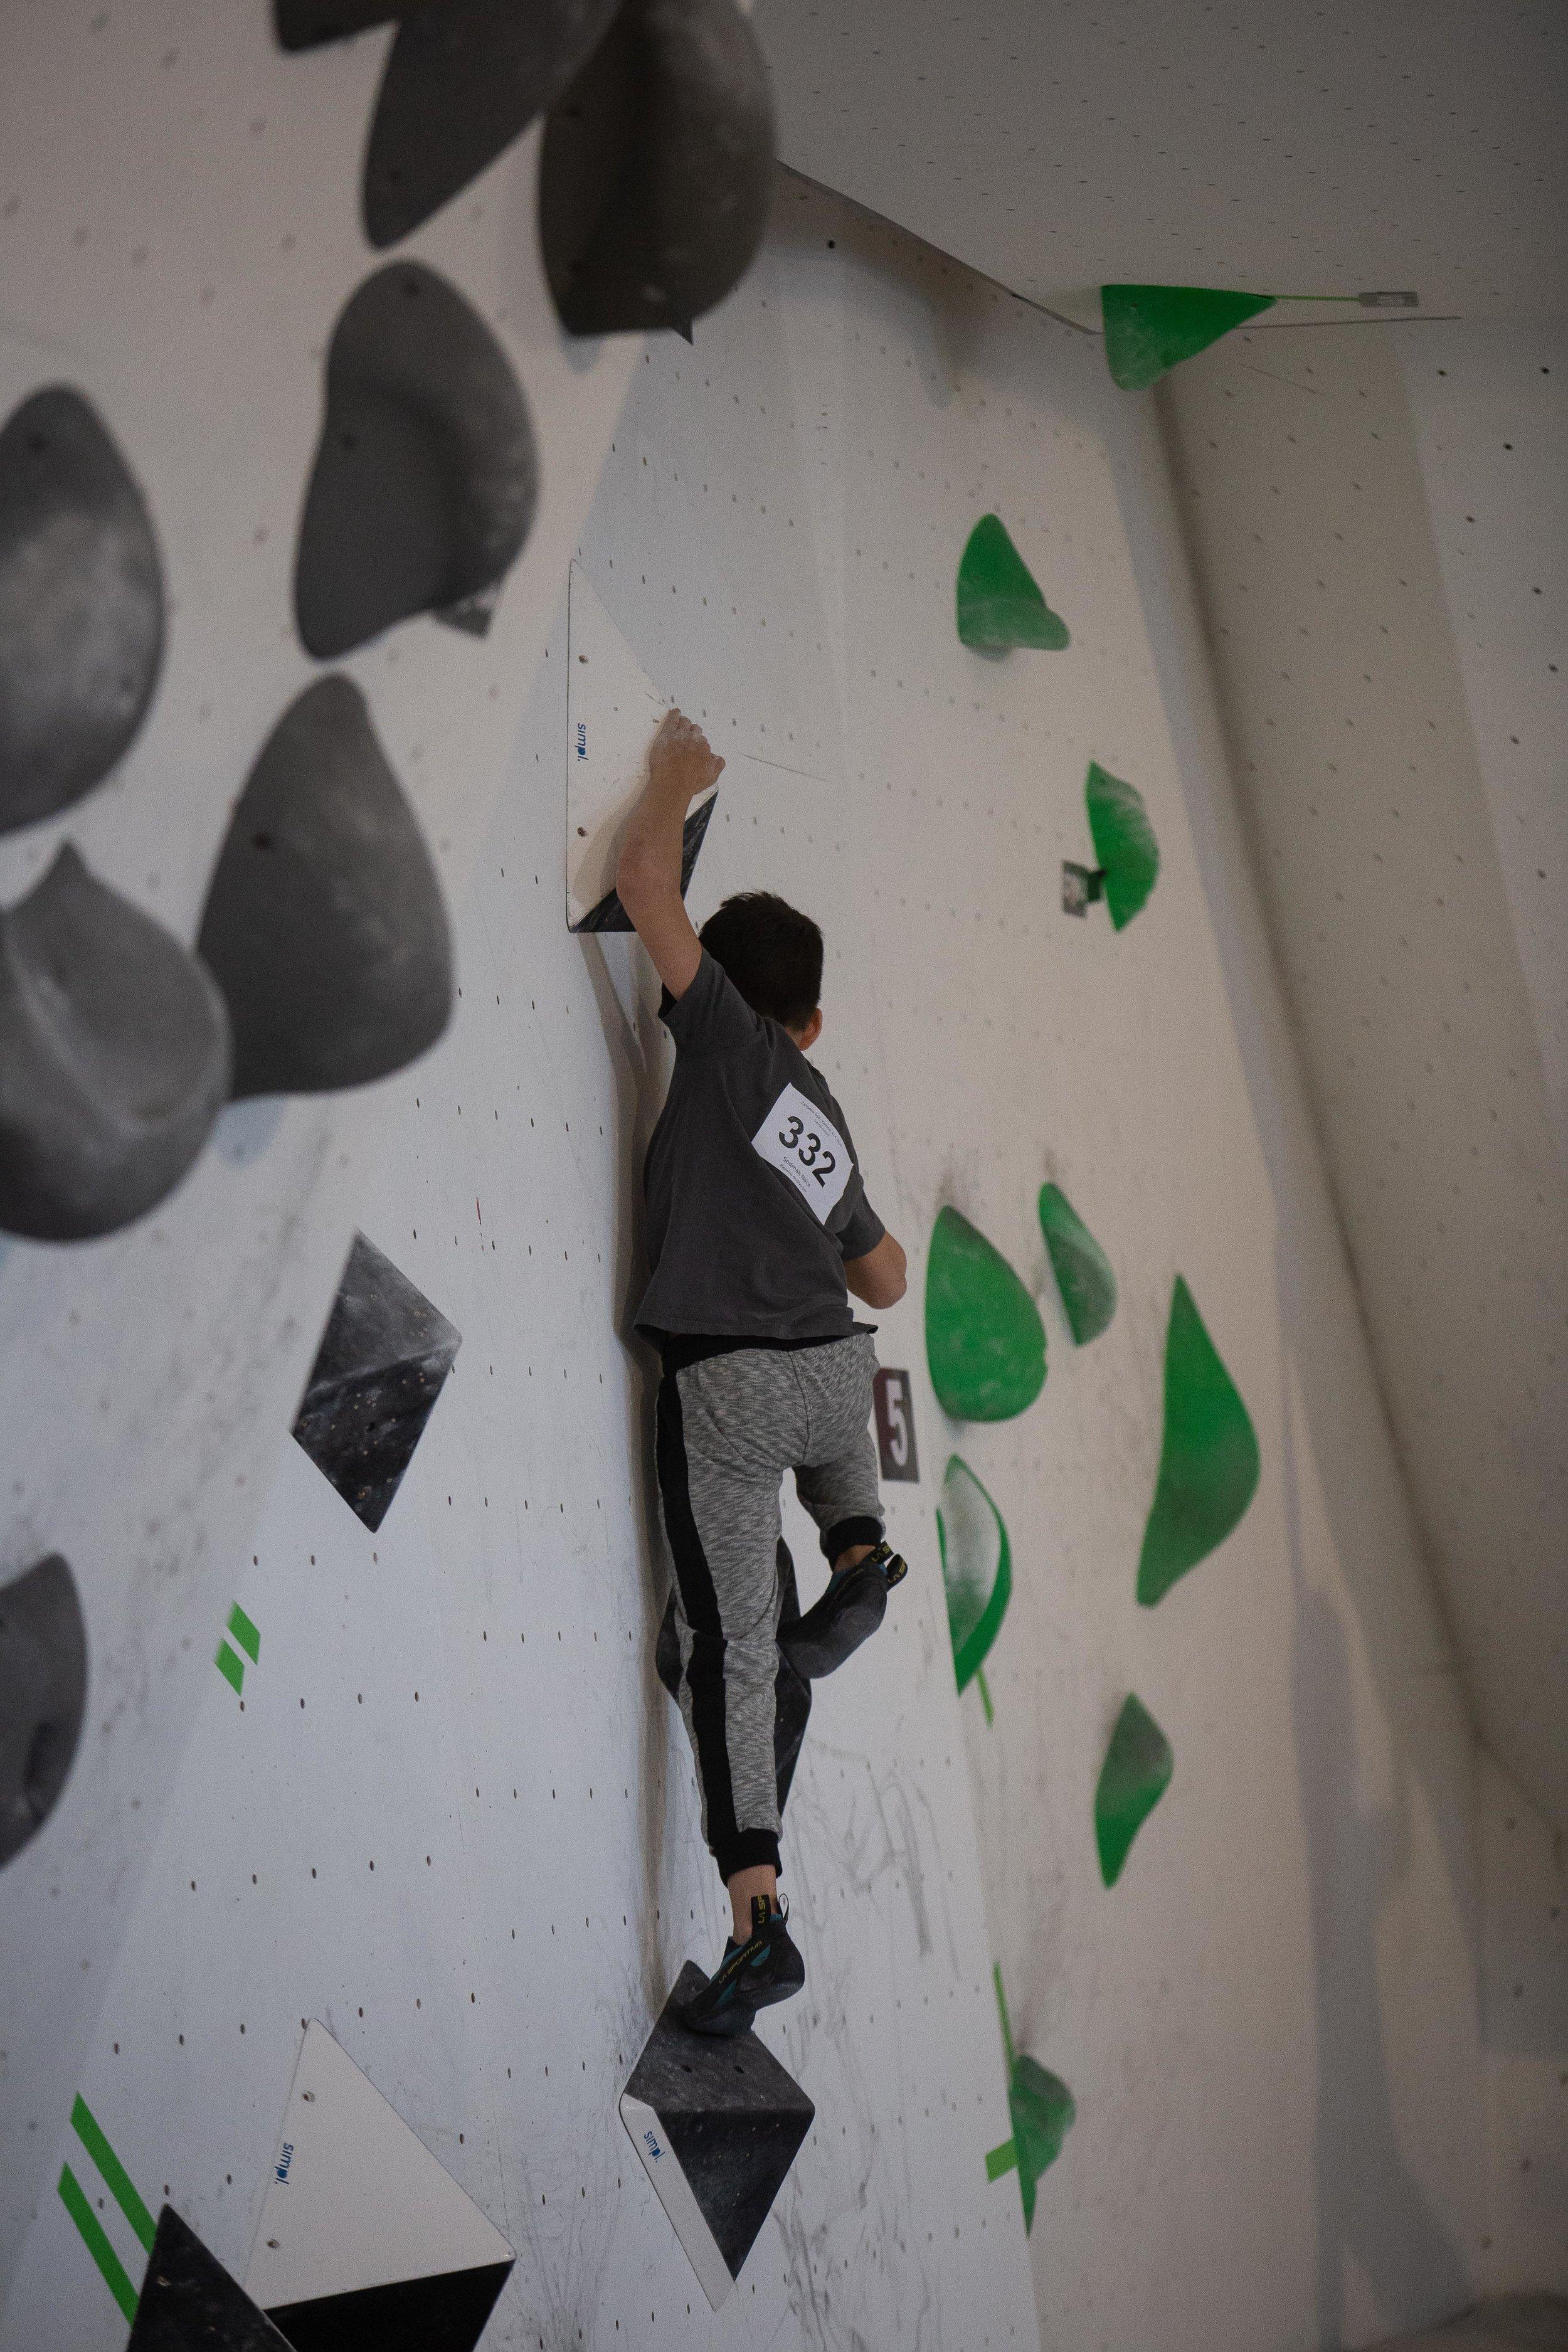 Plezalni tekma Grif Kamnik 2019_151.jpg